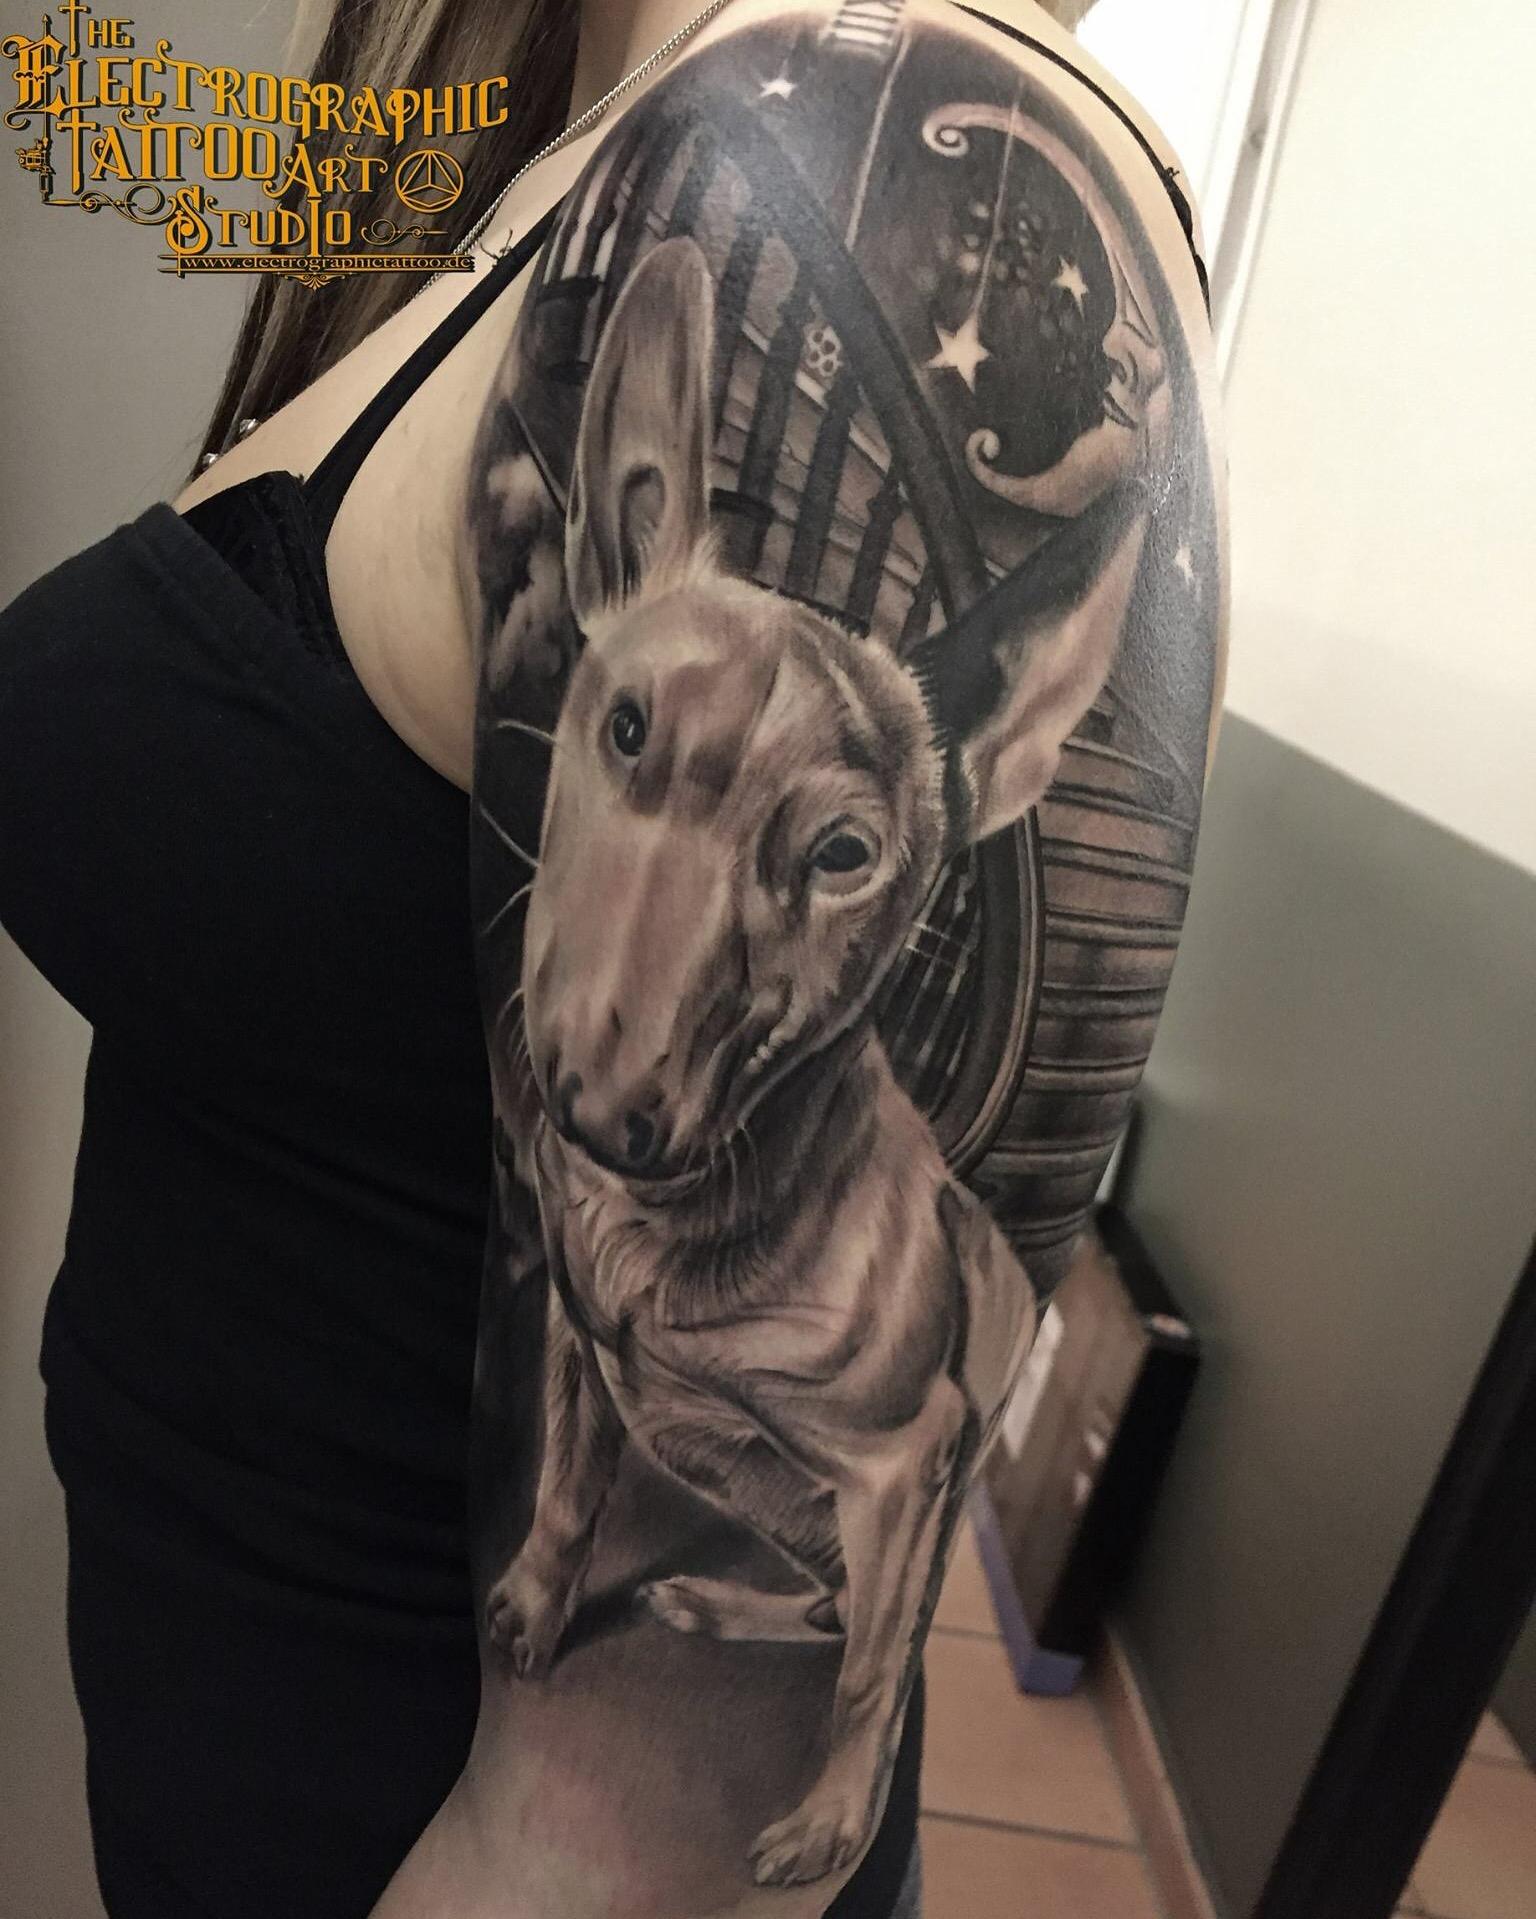 bull terrier, surreal, electrographic tattoo,germany, bayern, rosenheim, münchen , salzburg , innsbruck, vogel, rose, tattoo, tattoo art, color, realistic